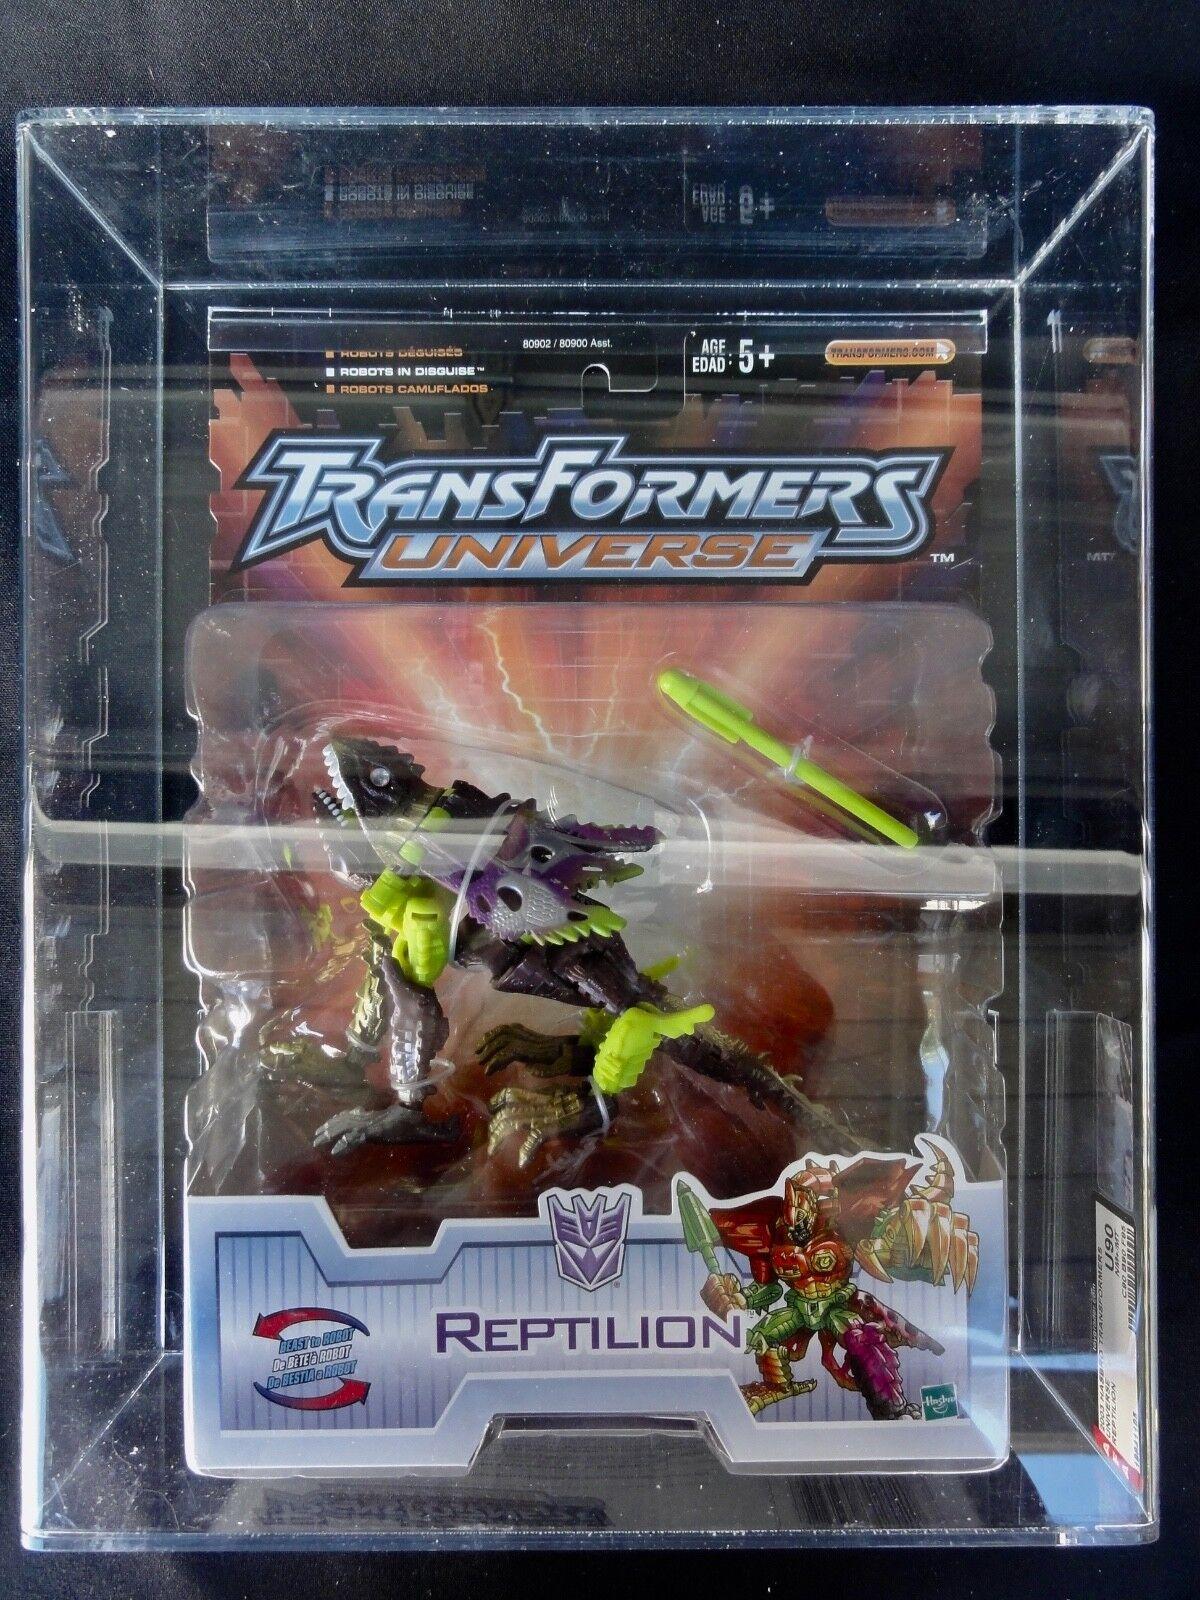 2003 Transformers AFA Universe Reptilion Tape Sealed MISB MIB BOX